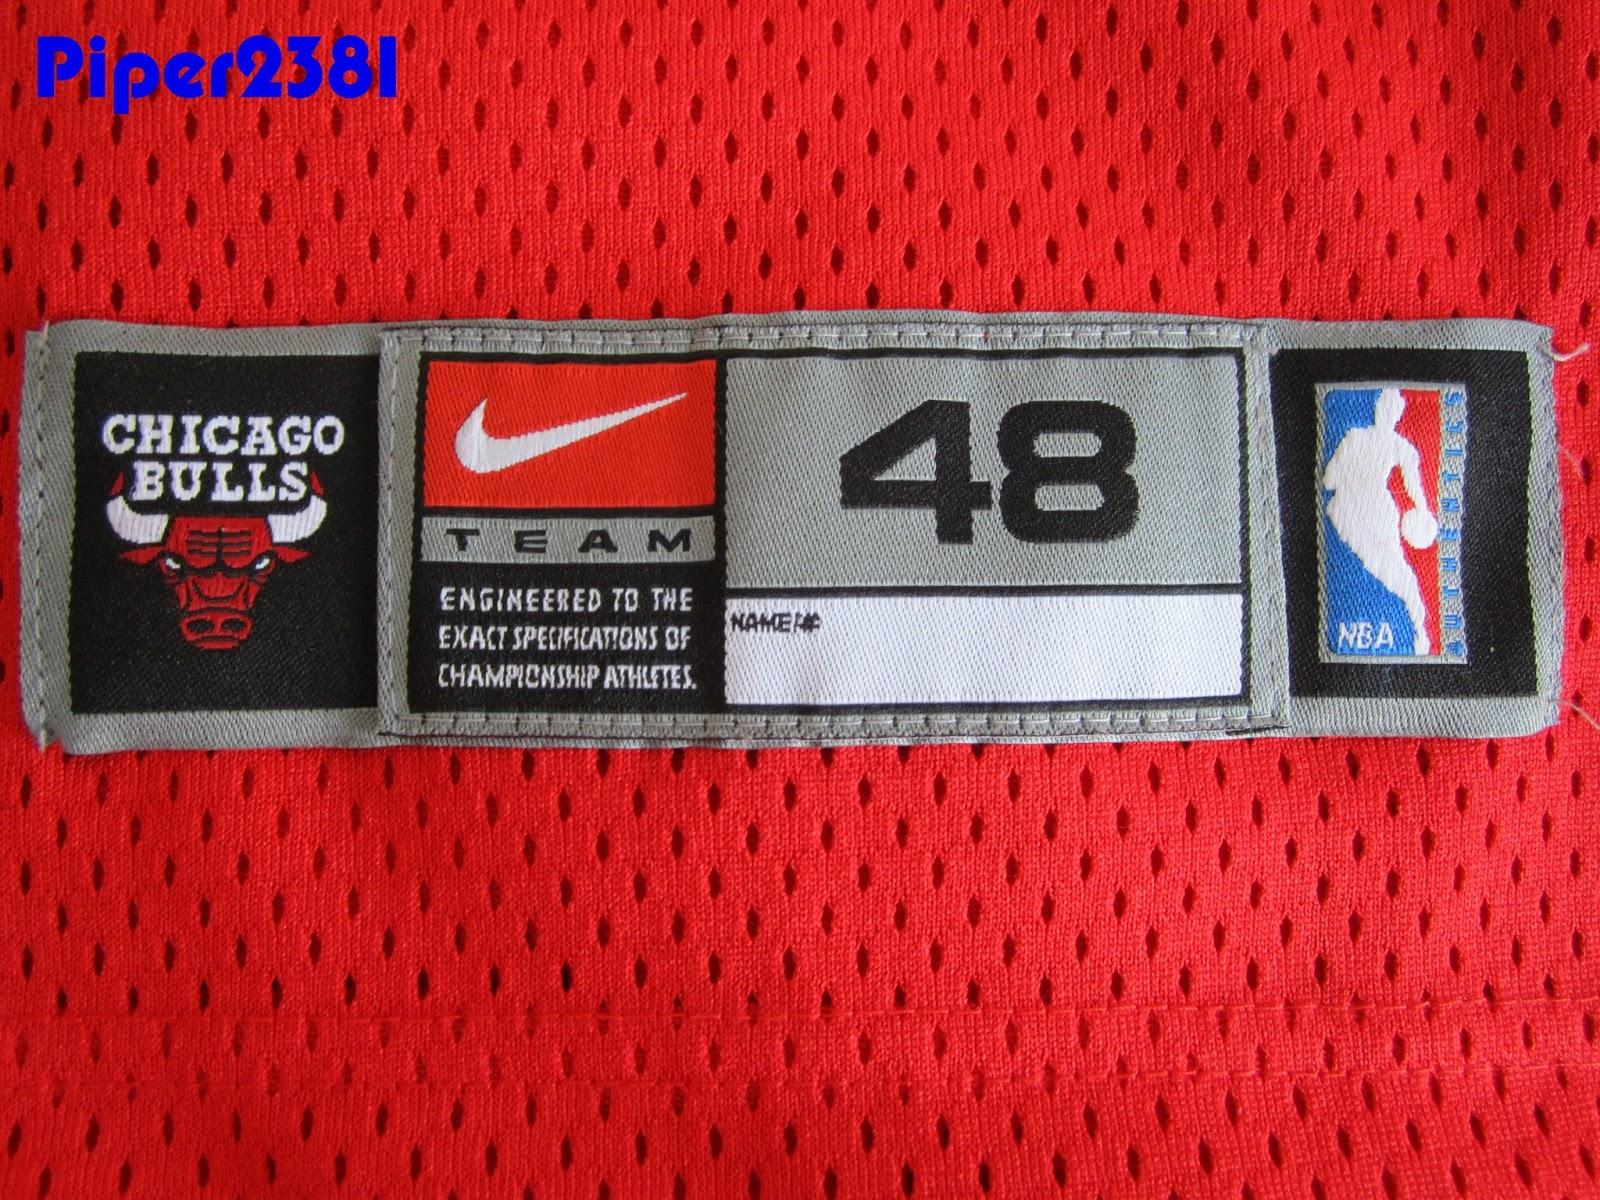 Nike Jordan Jersey Bulls Bulls Jersey Made by Nike